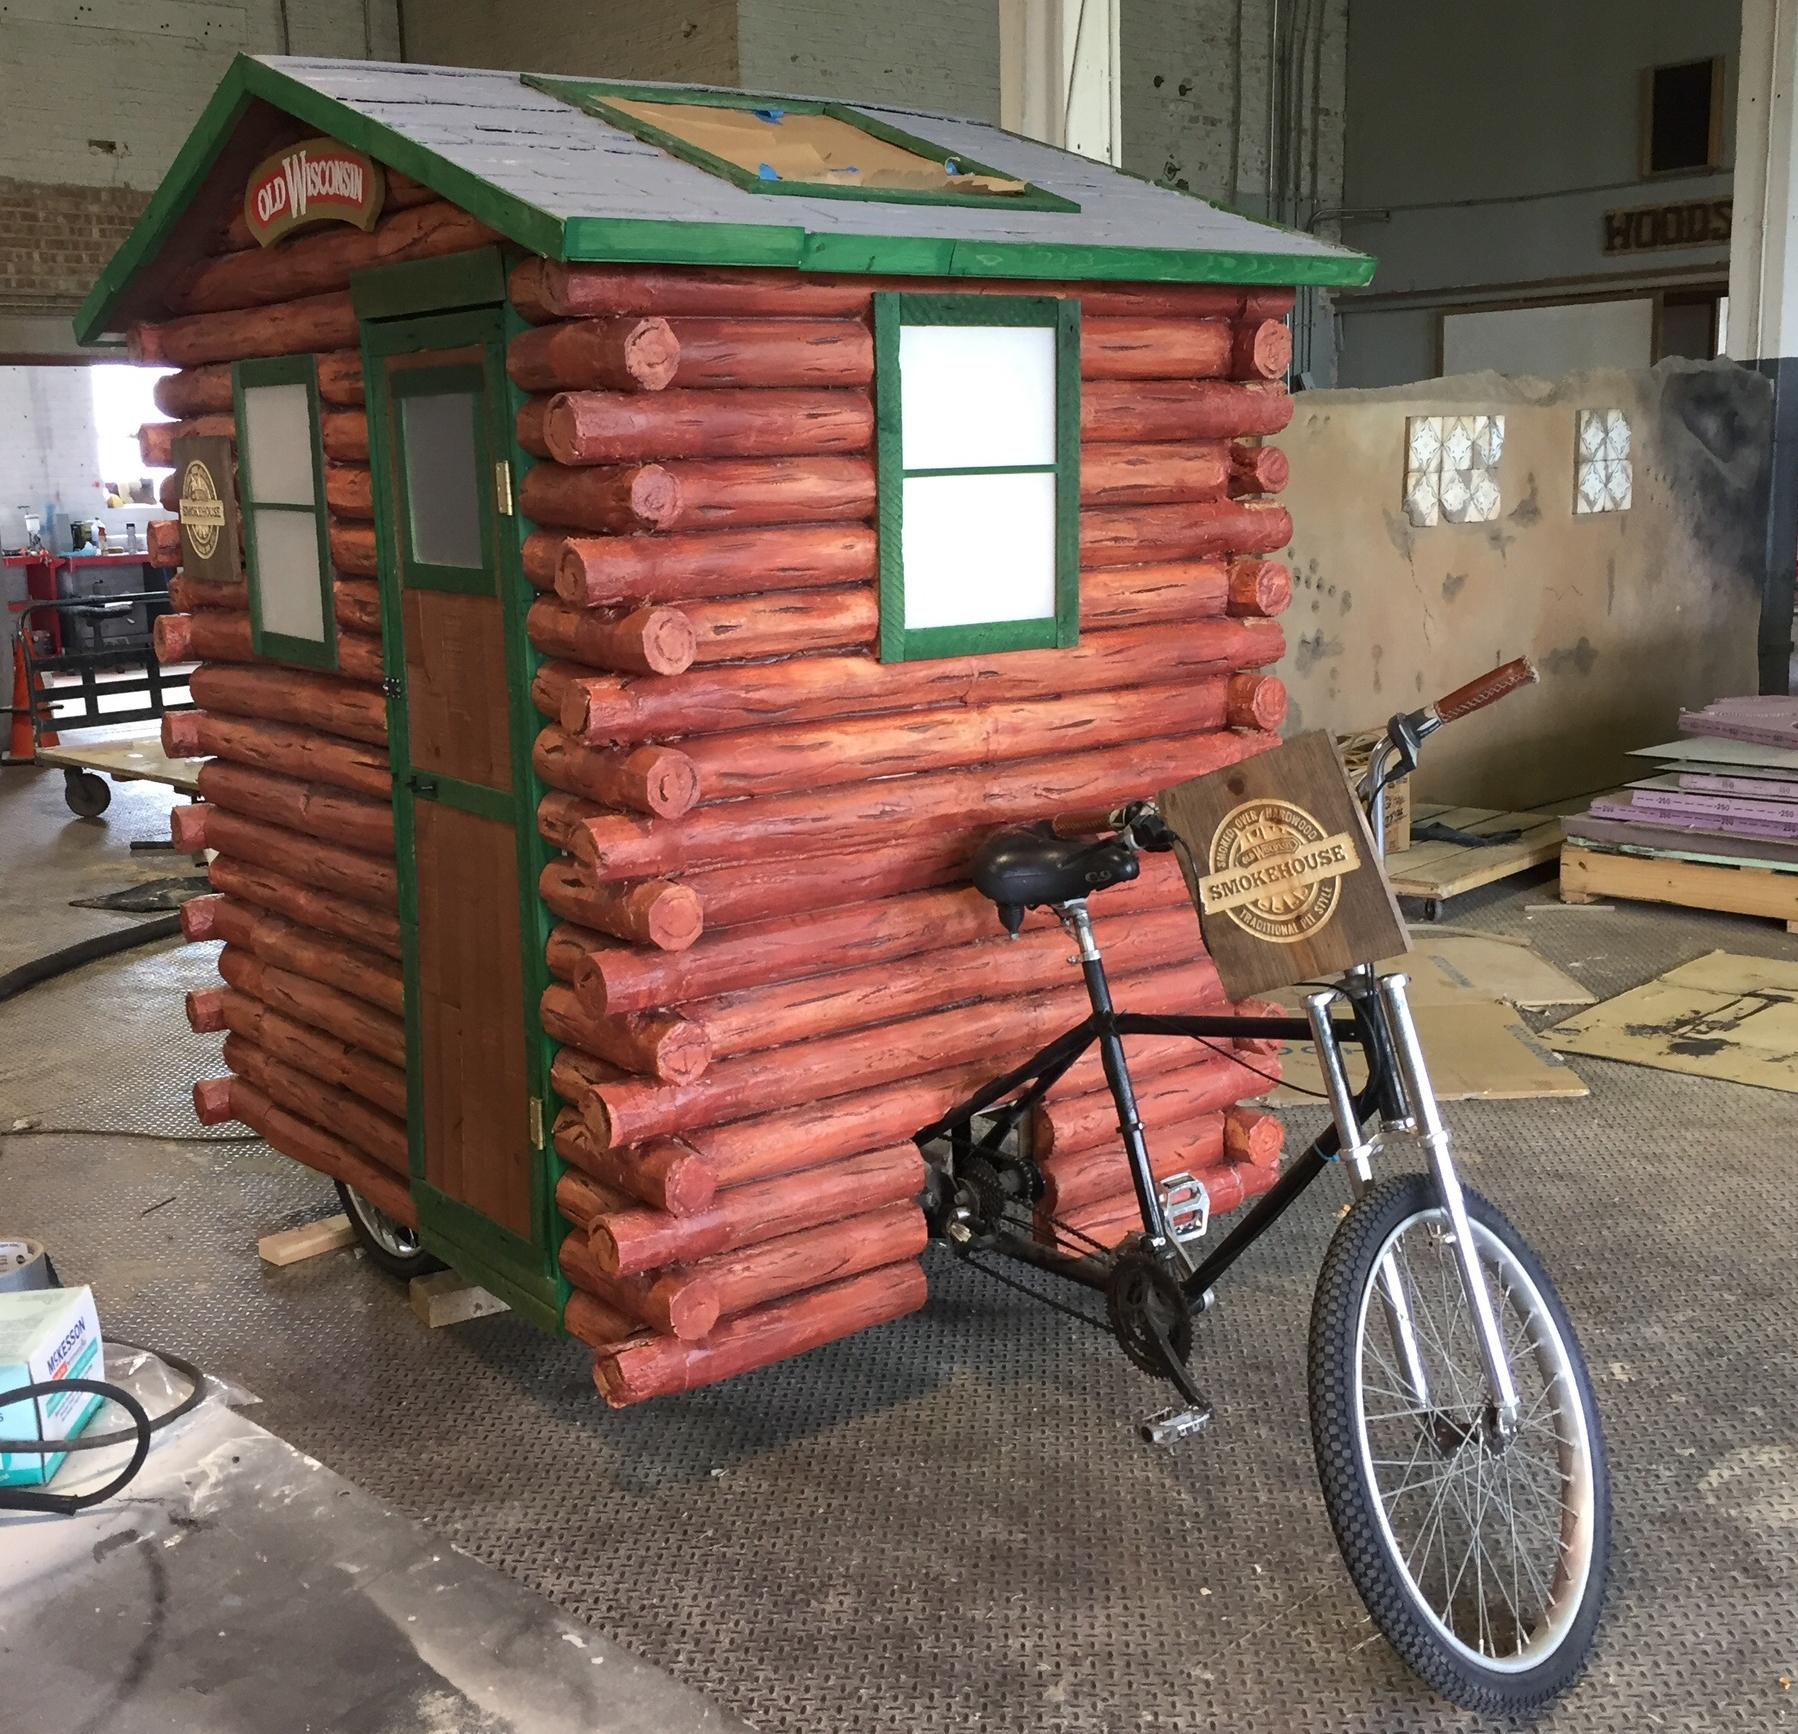 Pedi-Cabin